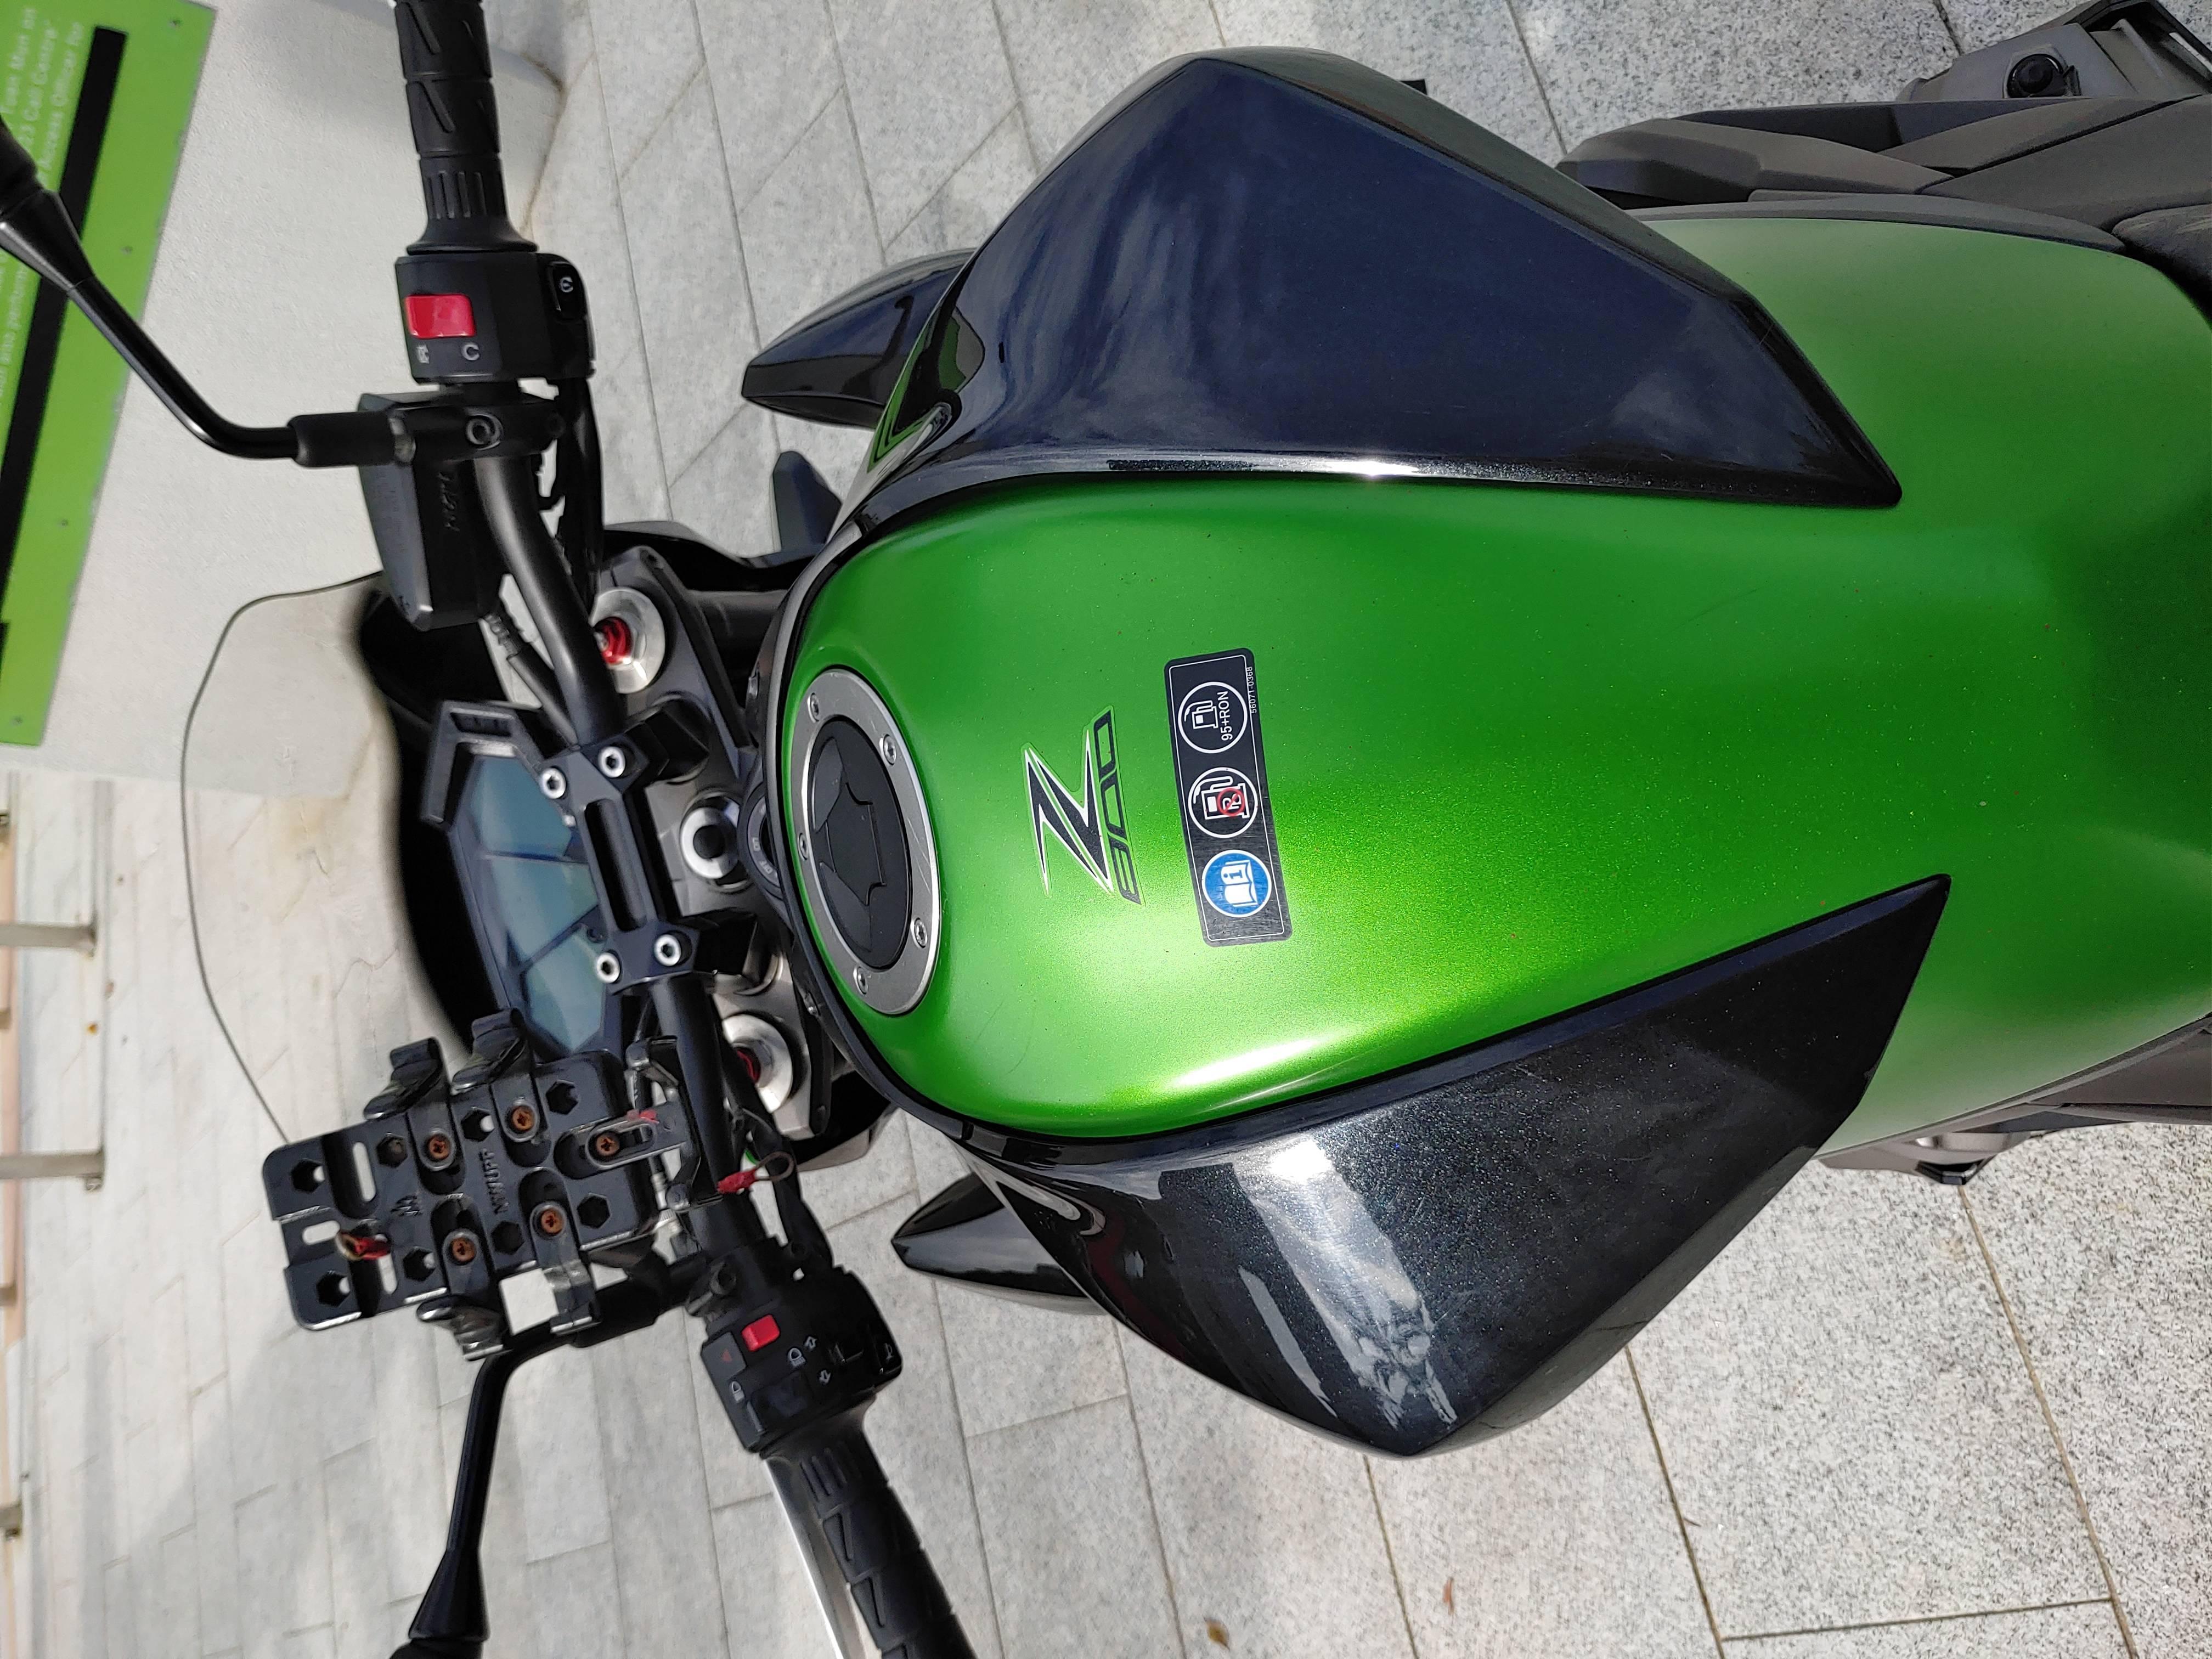 KAWASAKI Z800 2014    -「Webike摩托車市」